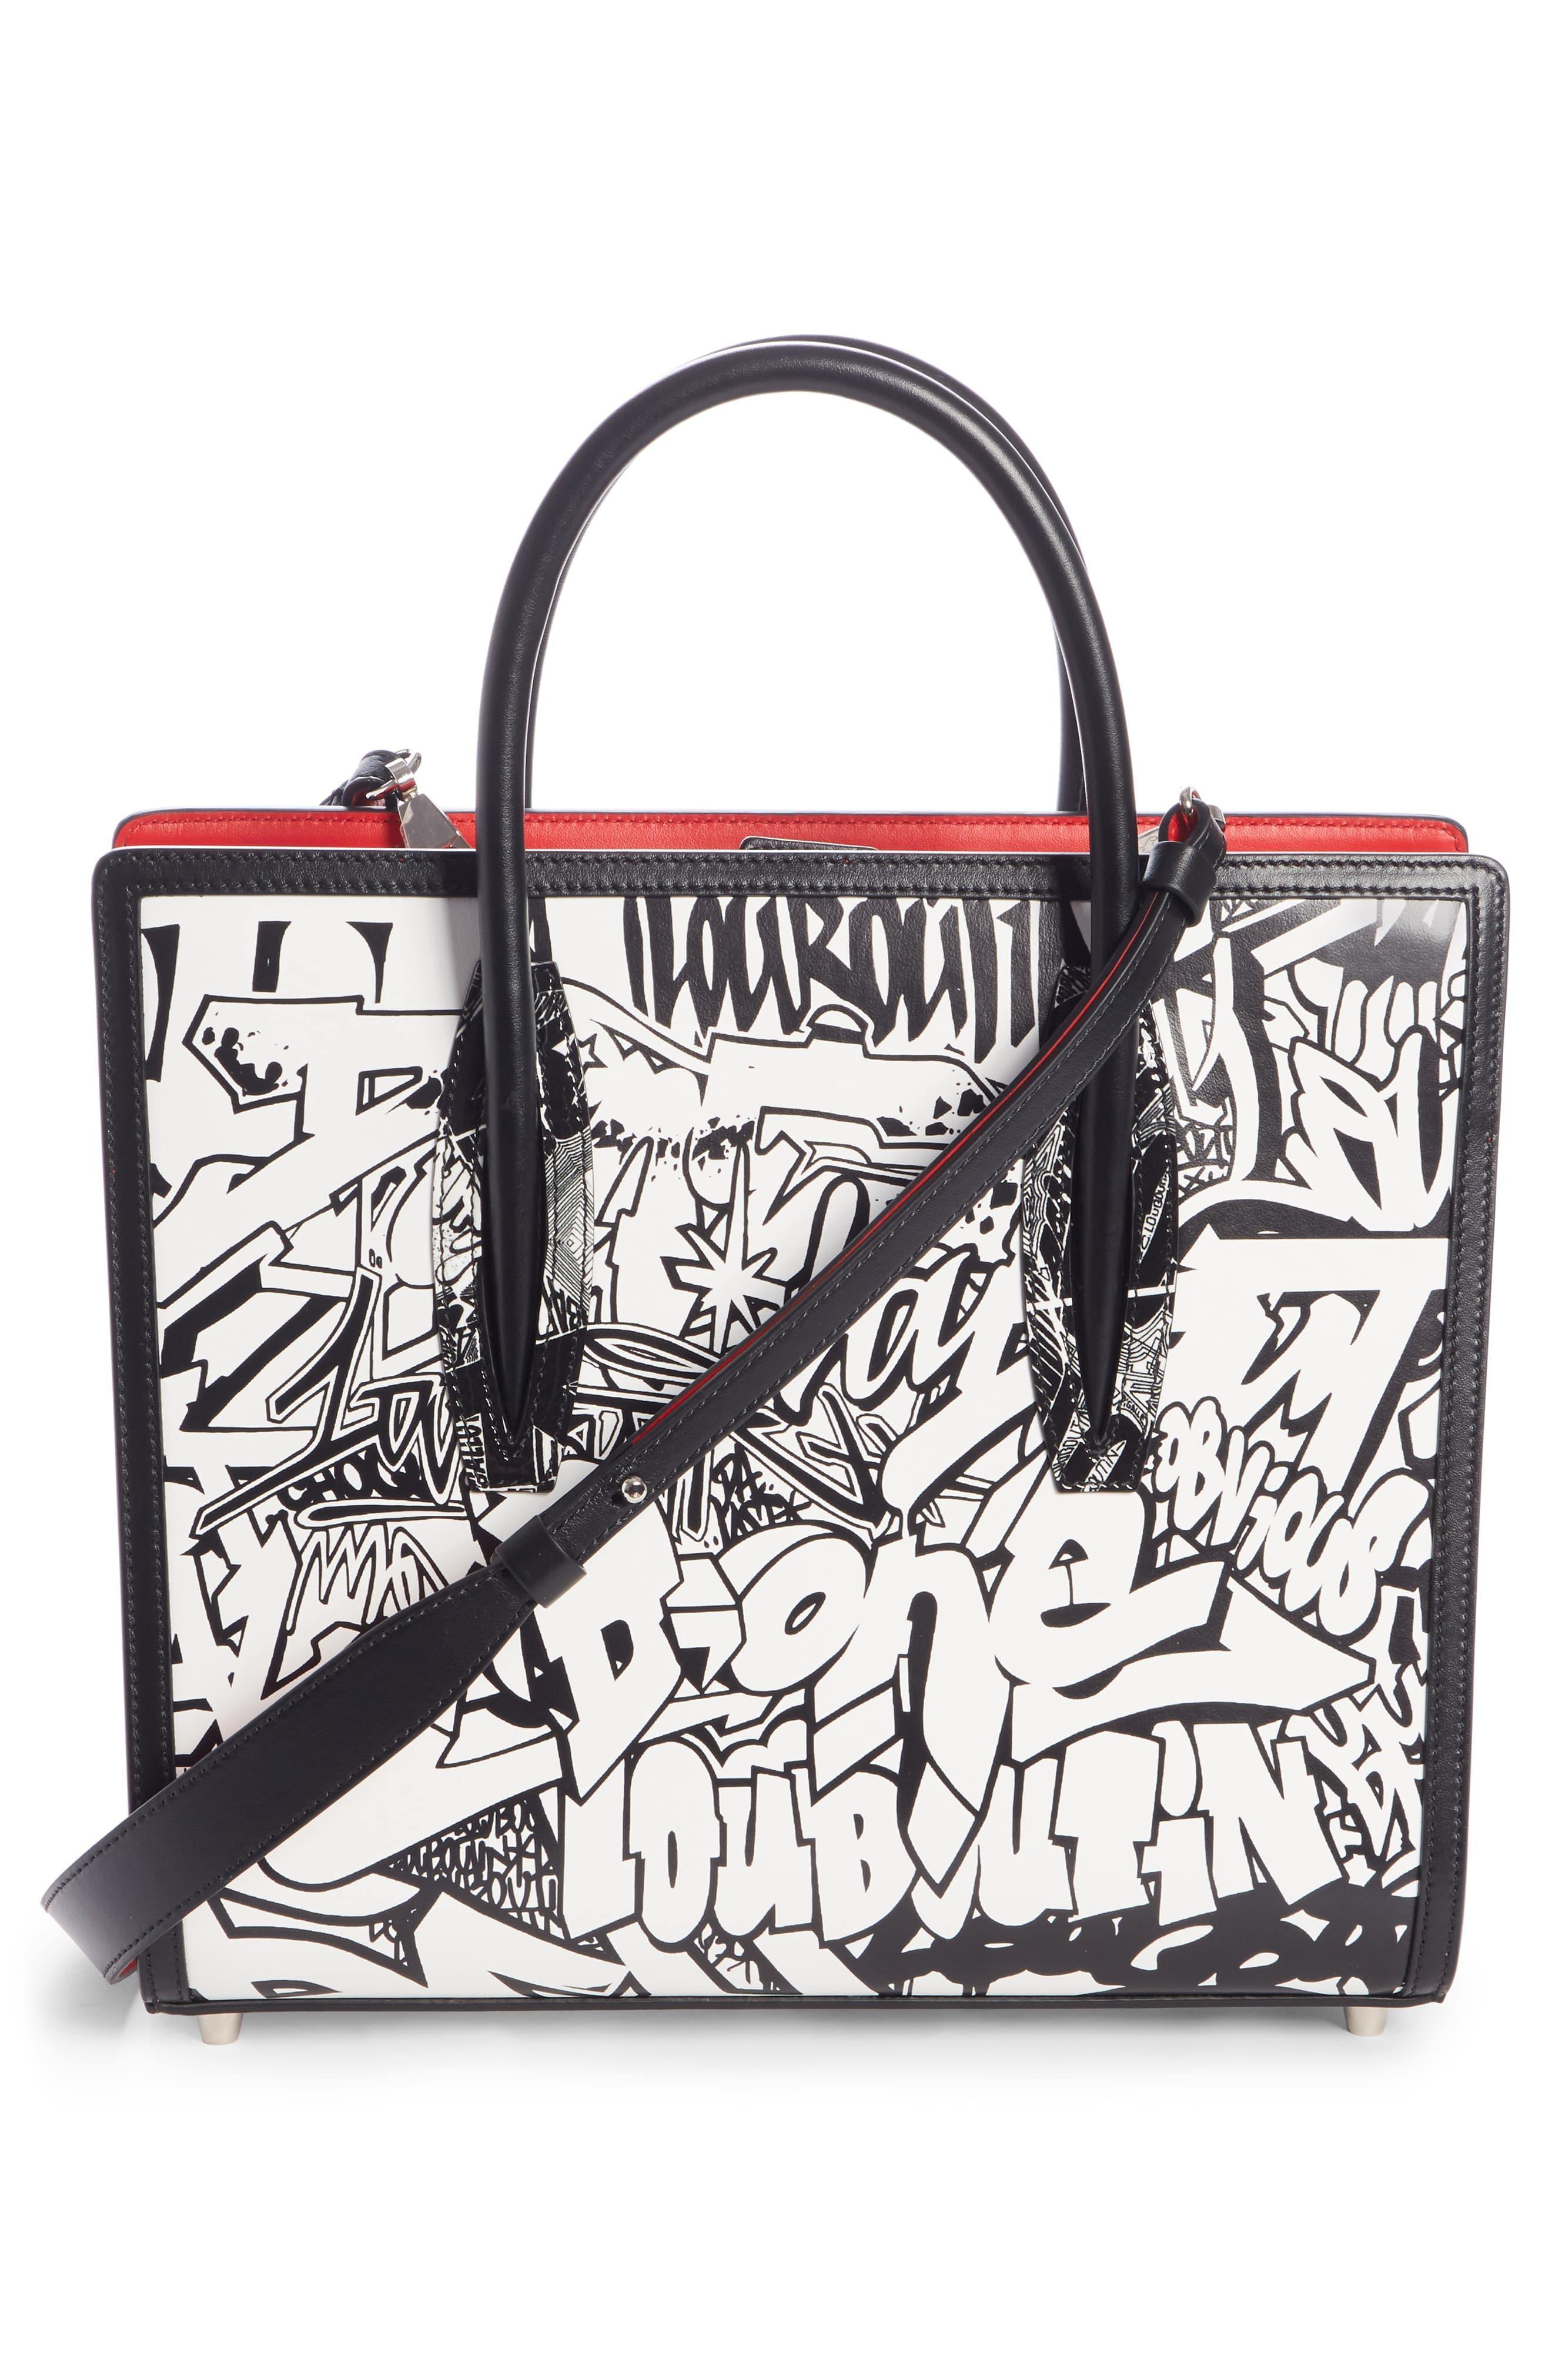 b199a4e0c21 Christian Louboutin Black Medium Paloma Paris Leather Tote -